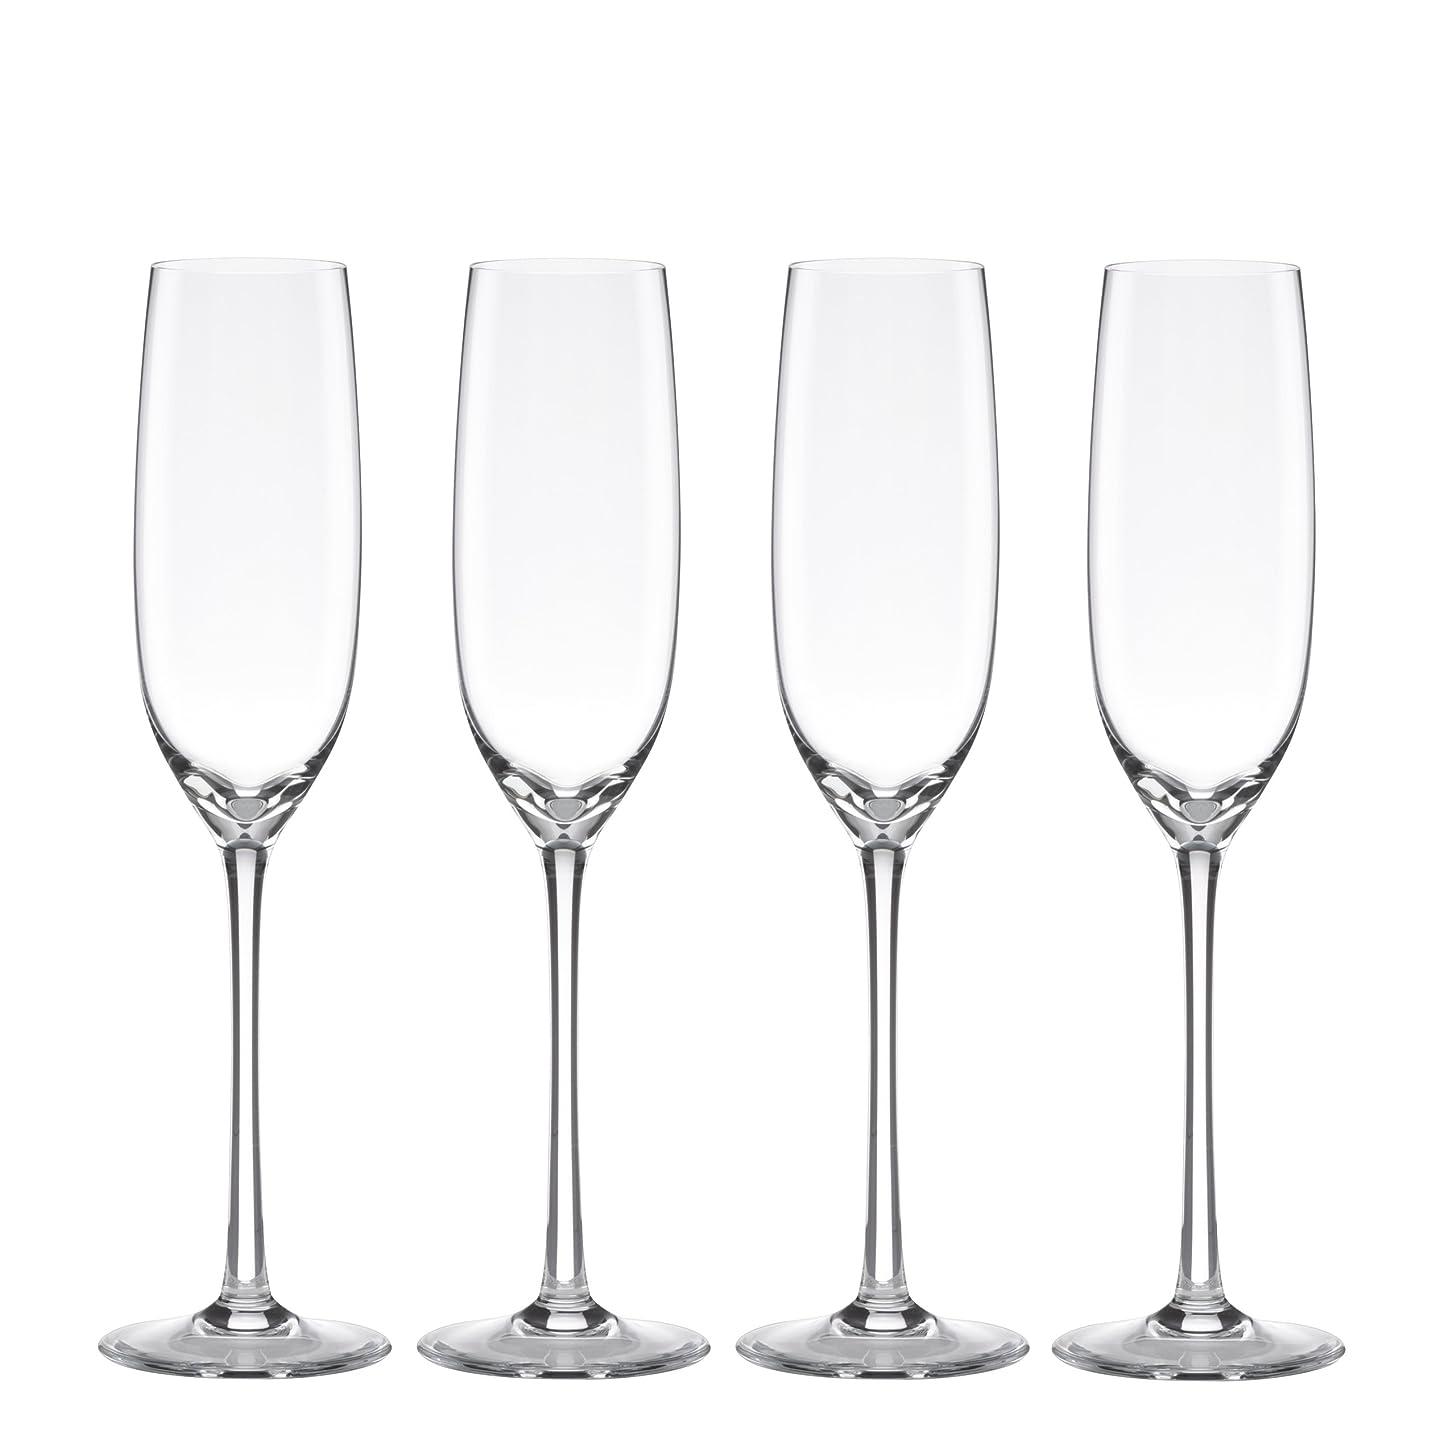 Lenox Tuscany Classics Fluted Champagne Glassware, Set of 4